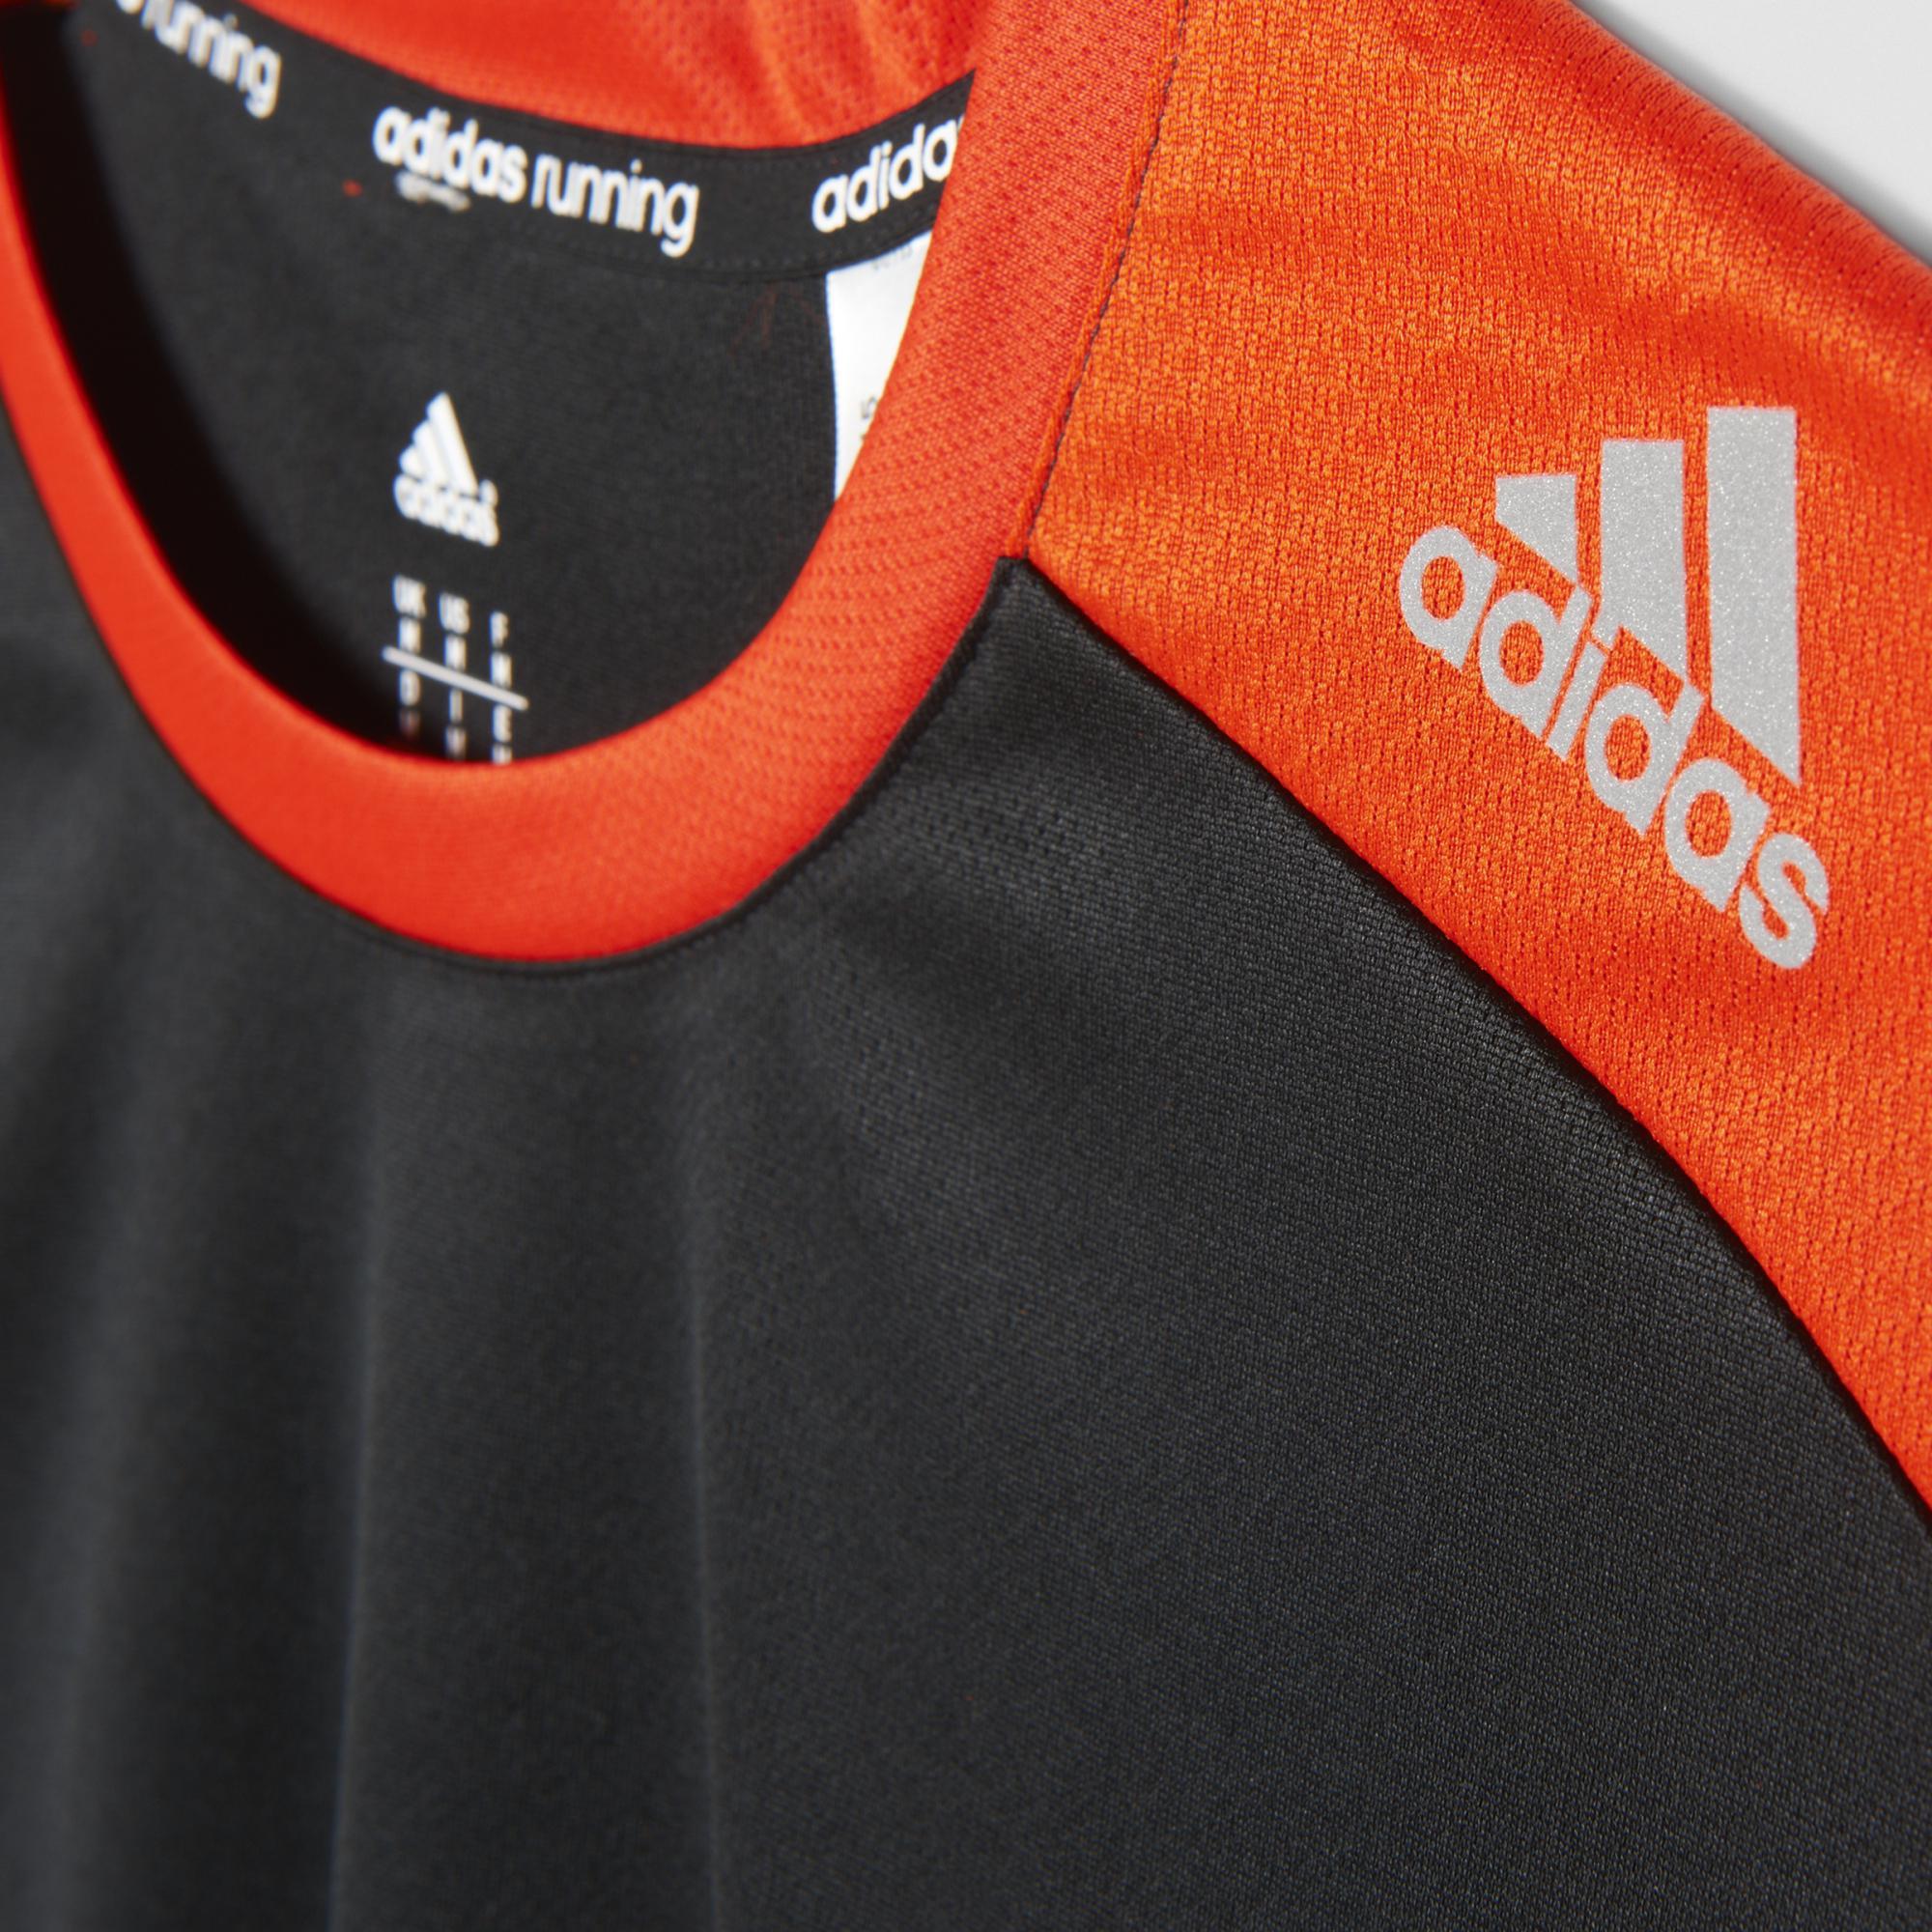 09c3ac1a050cd Adidas Mens Response Short Sleeve Tee - Black/Bold Orange ...